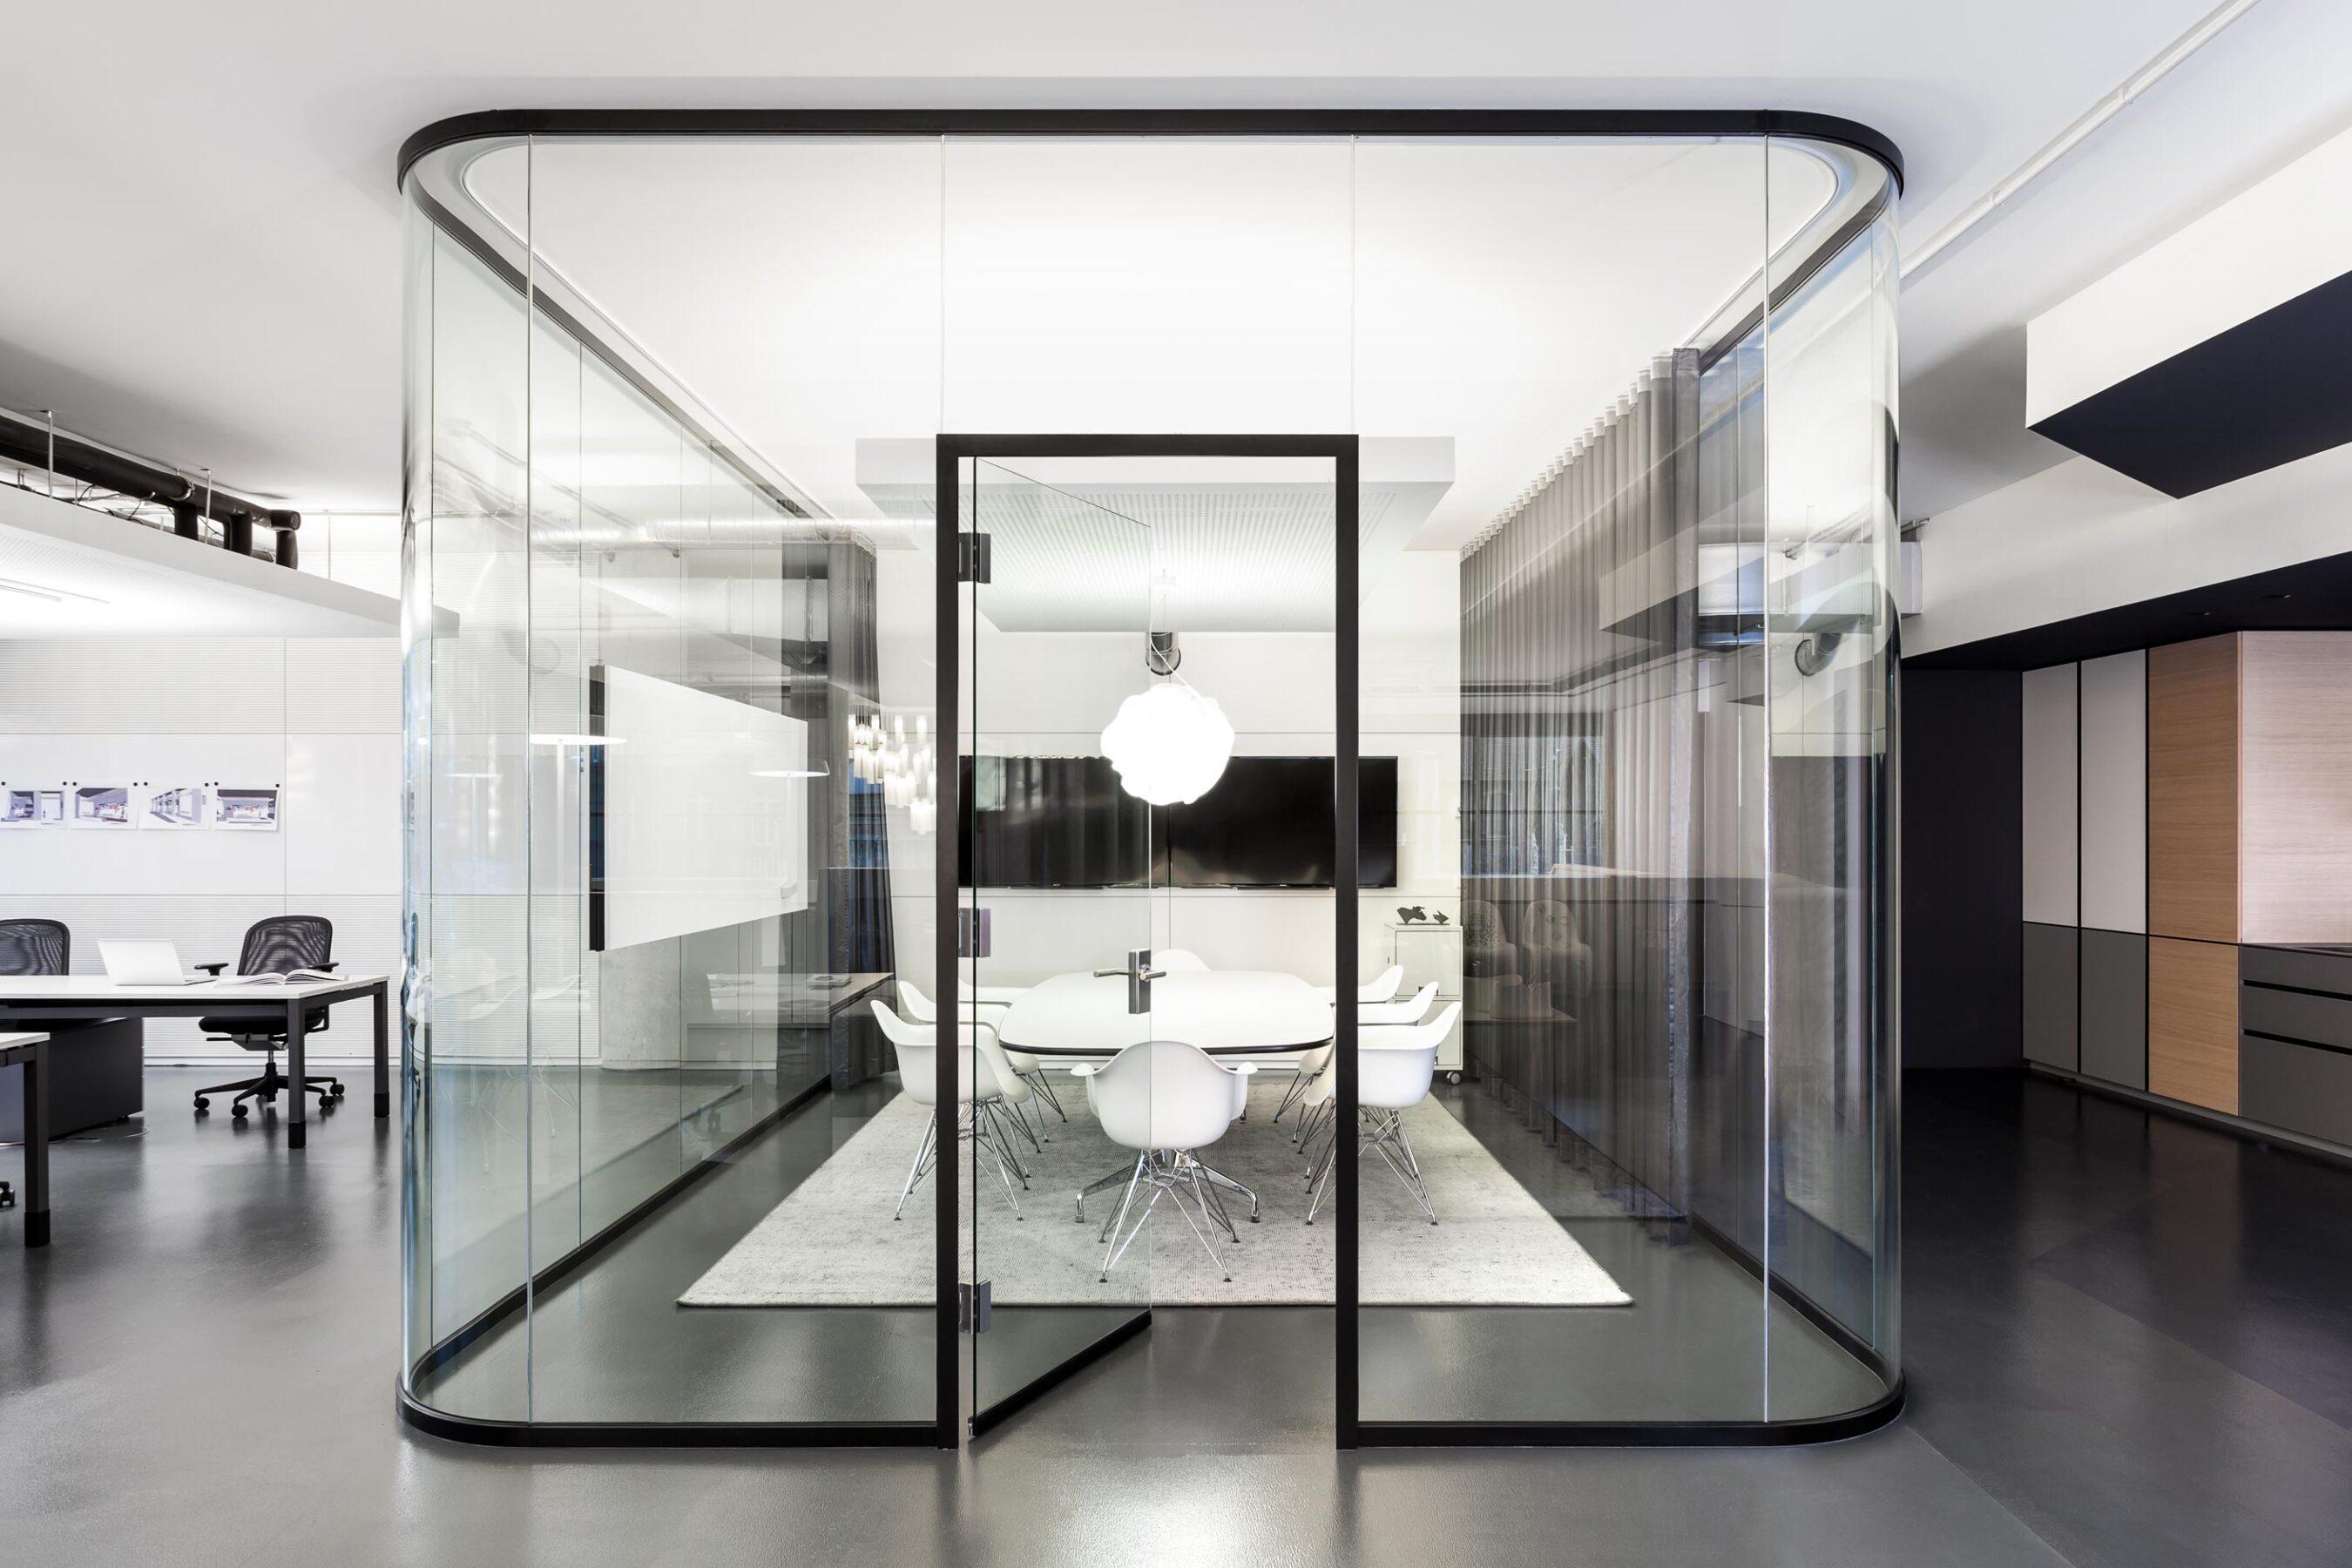 feco-feederle│partition walls│Kymo Floorwear Karlsruhe